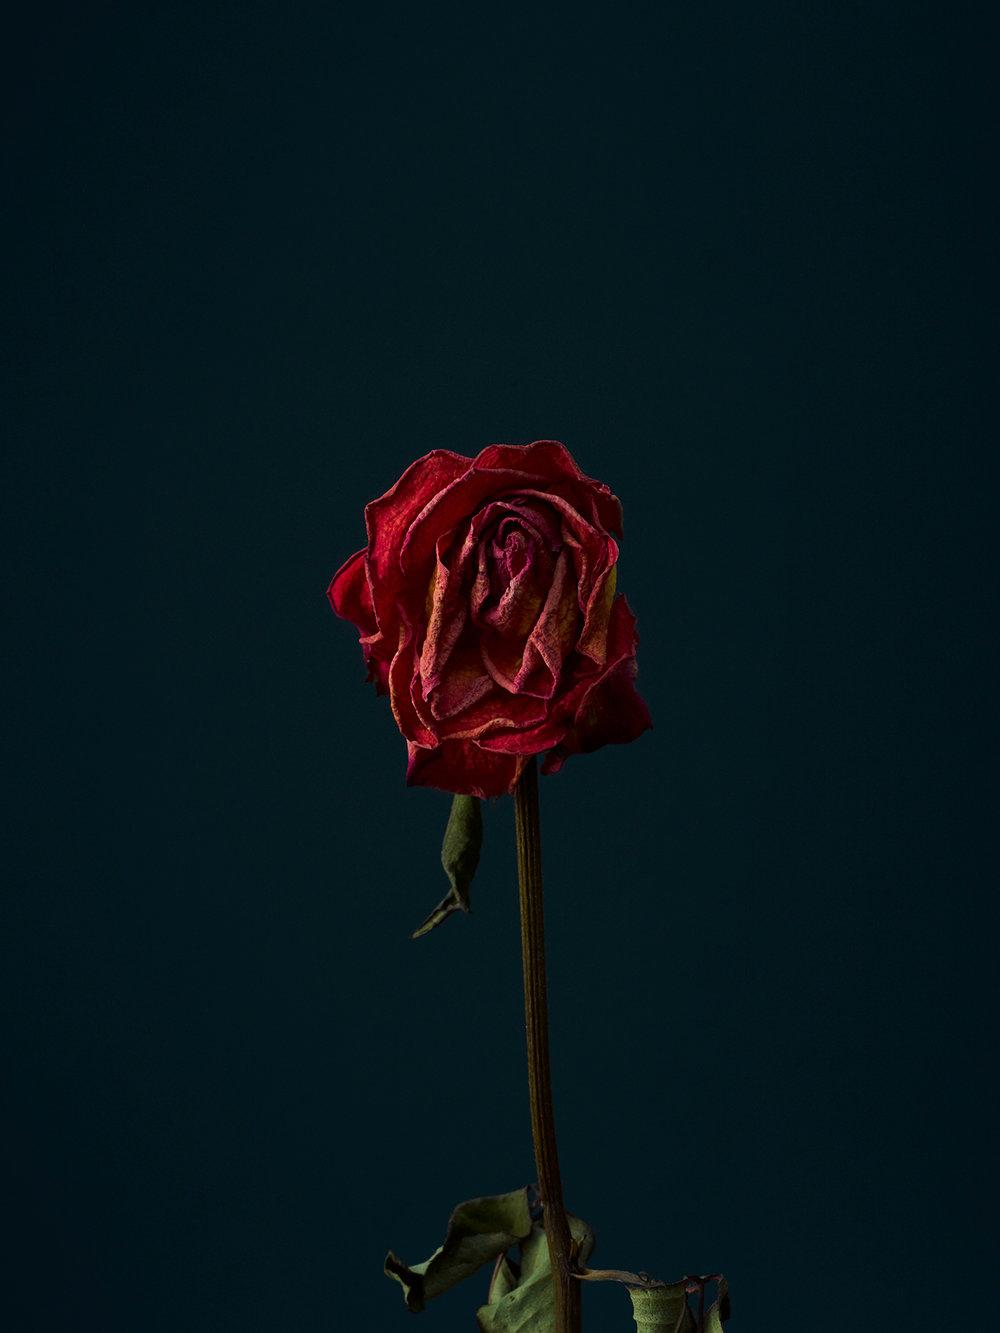 rose-8-copy.jpg